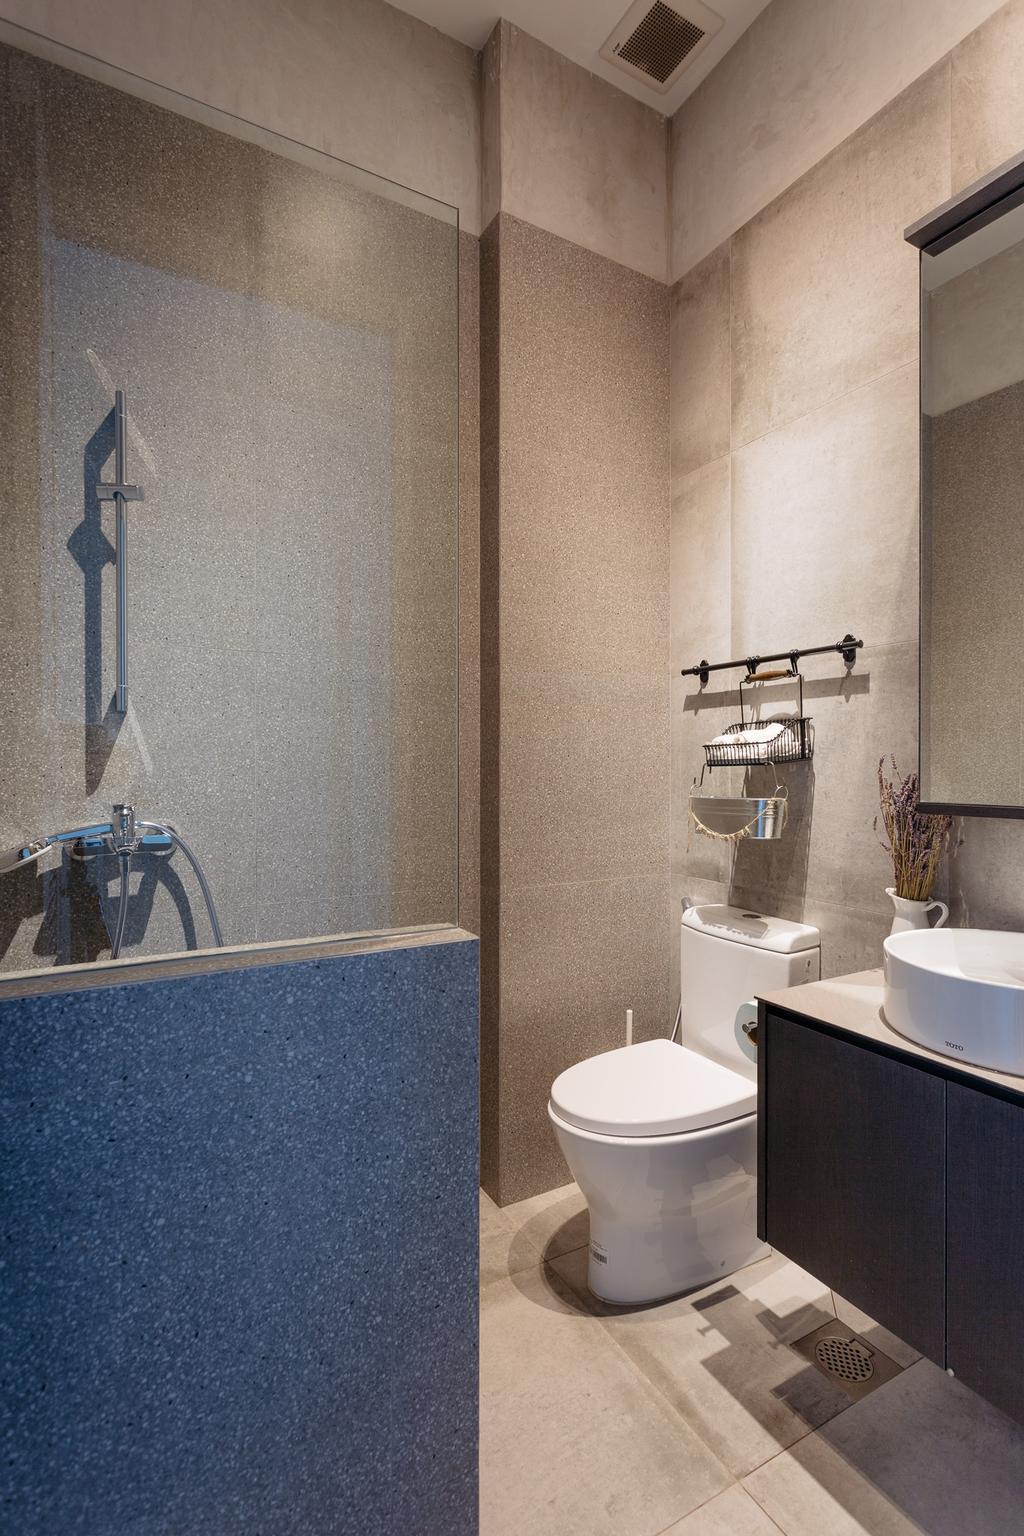 Transitional, Condo, Bathroom, Crescendo Park, Interior Designer, Habit, Flora, Jar, Plant, Potted Plant, Pottery, Vase, Toilet